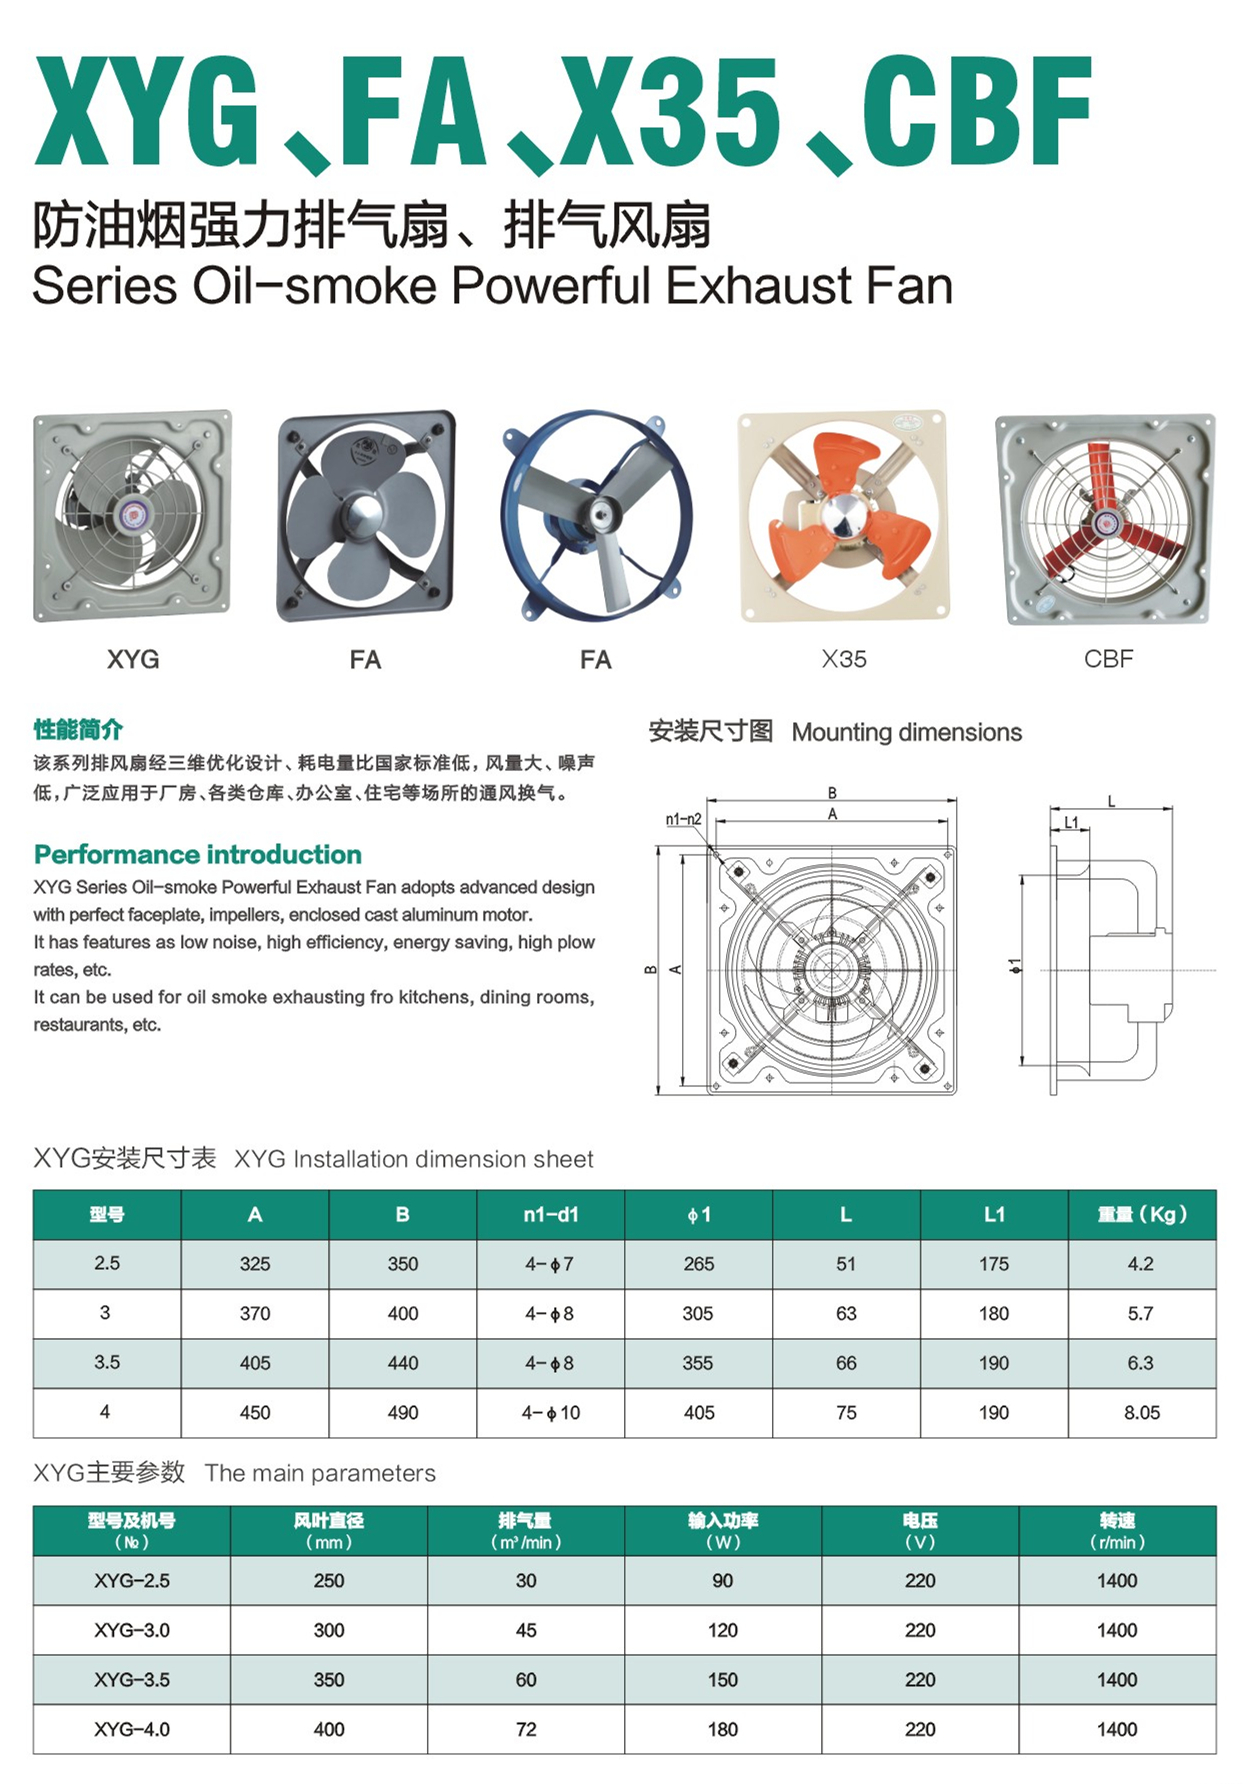 XYG/FA/X35/CBF Powerful Oil Smoke High quality low noise long-range air supply smoking Exhaust Fan